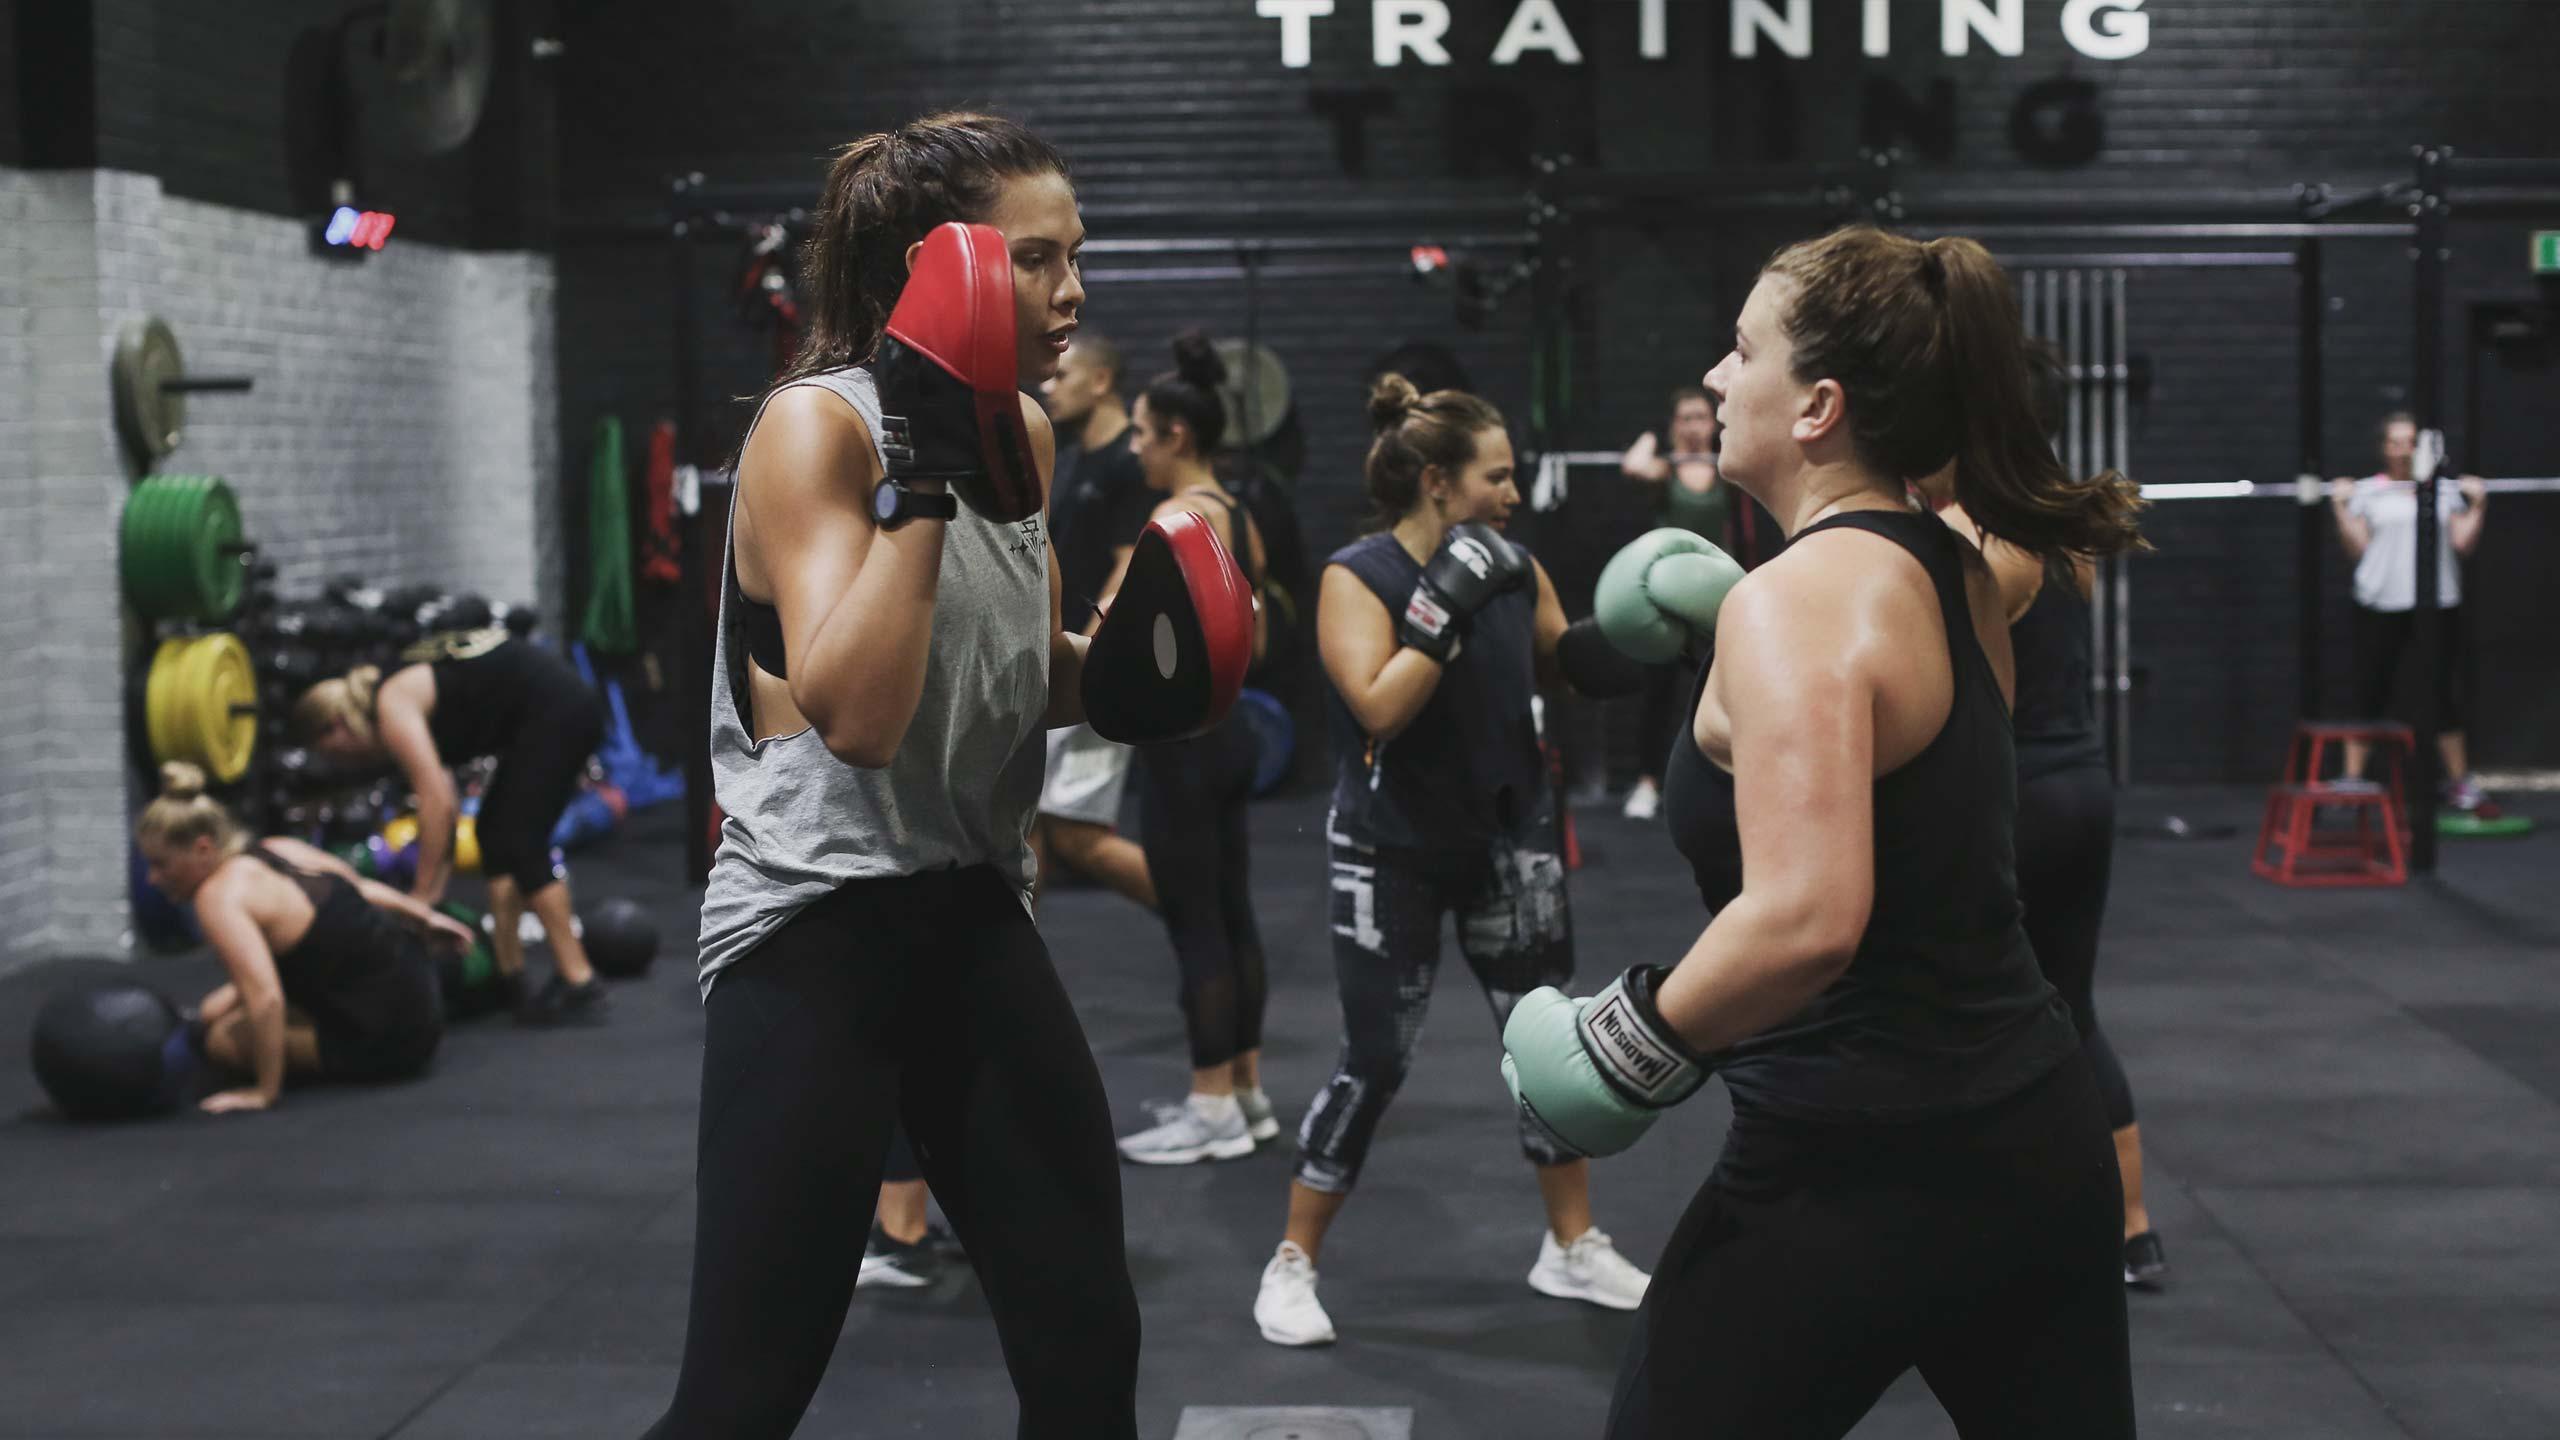 women training boxing exercises in vale tudo unleash program